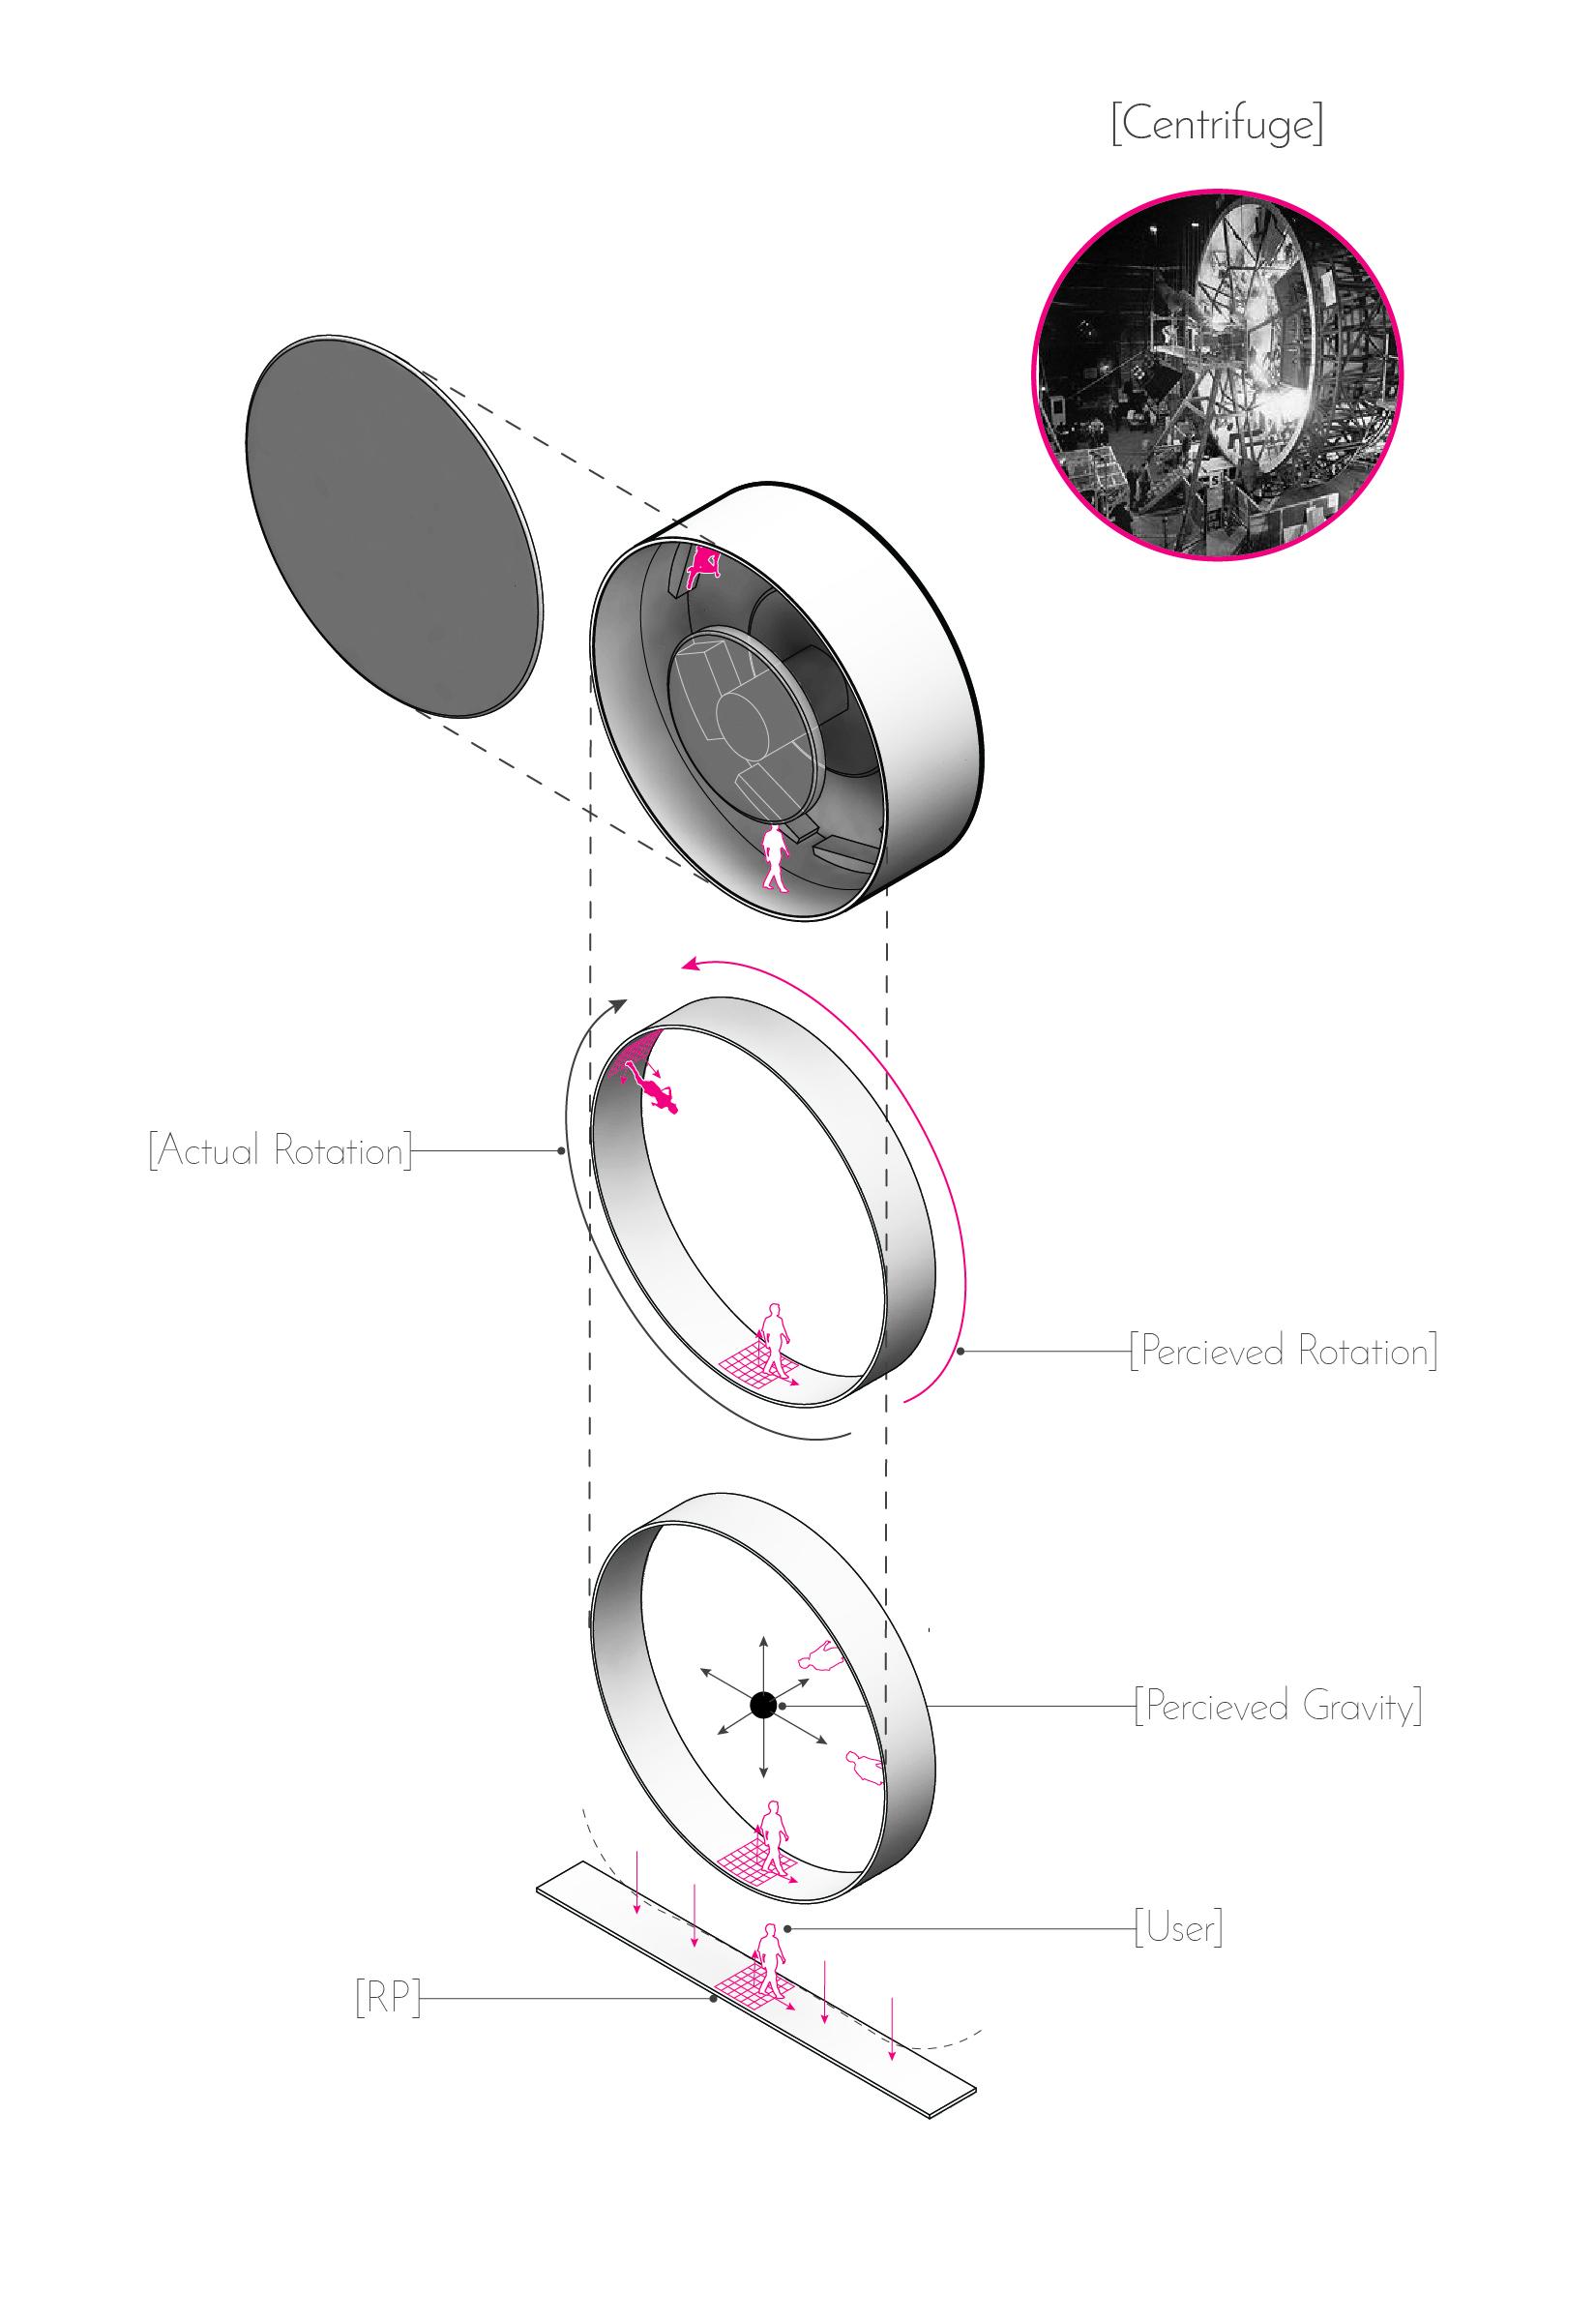 Centrifuge Diagram_V2_Cropped.jpg